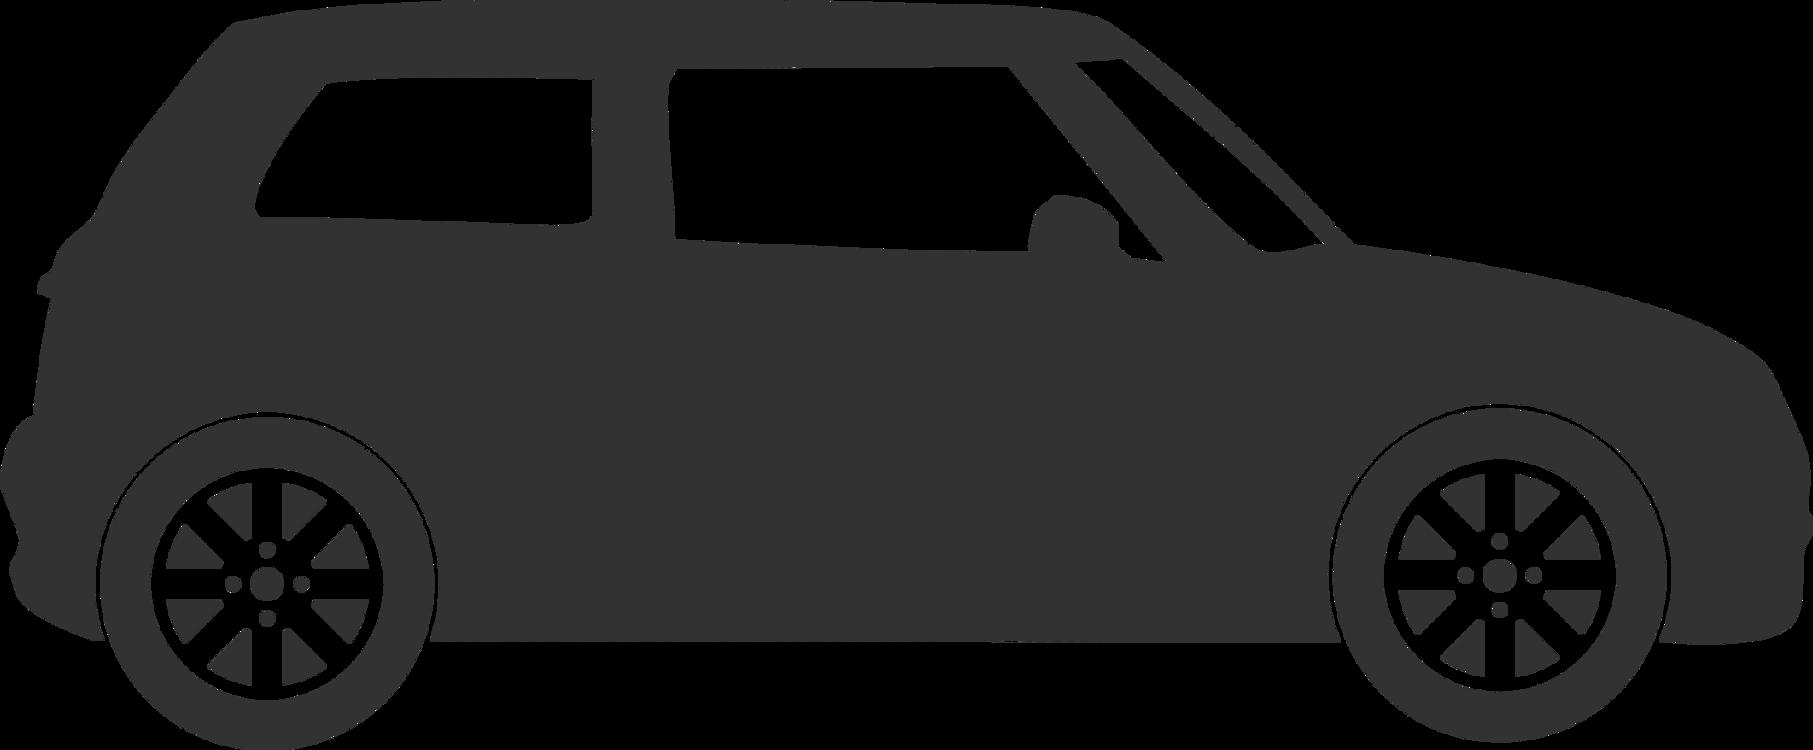 Suzuki car clipart clip freeuse download Wheel,Automotive Exterior,Compact Car Clipart - Royalty Free ... clip freeuse download